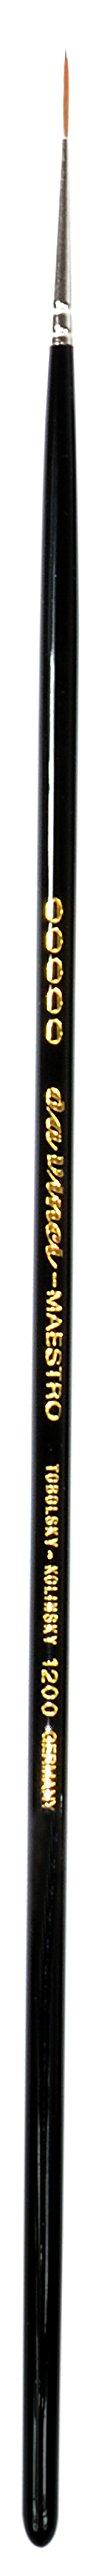 da Vinci Oil & Acrylic Series 1200 Maestro Rigger Brush, Medium-Length Sharp Needle-Point Kolinsky Red Sable with Black Polished Handle, Size 5/0